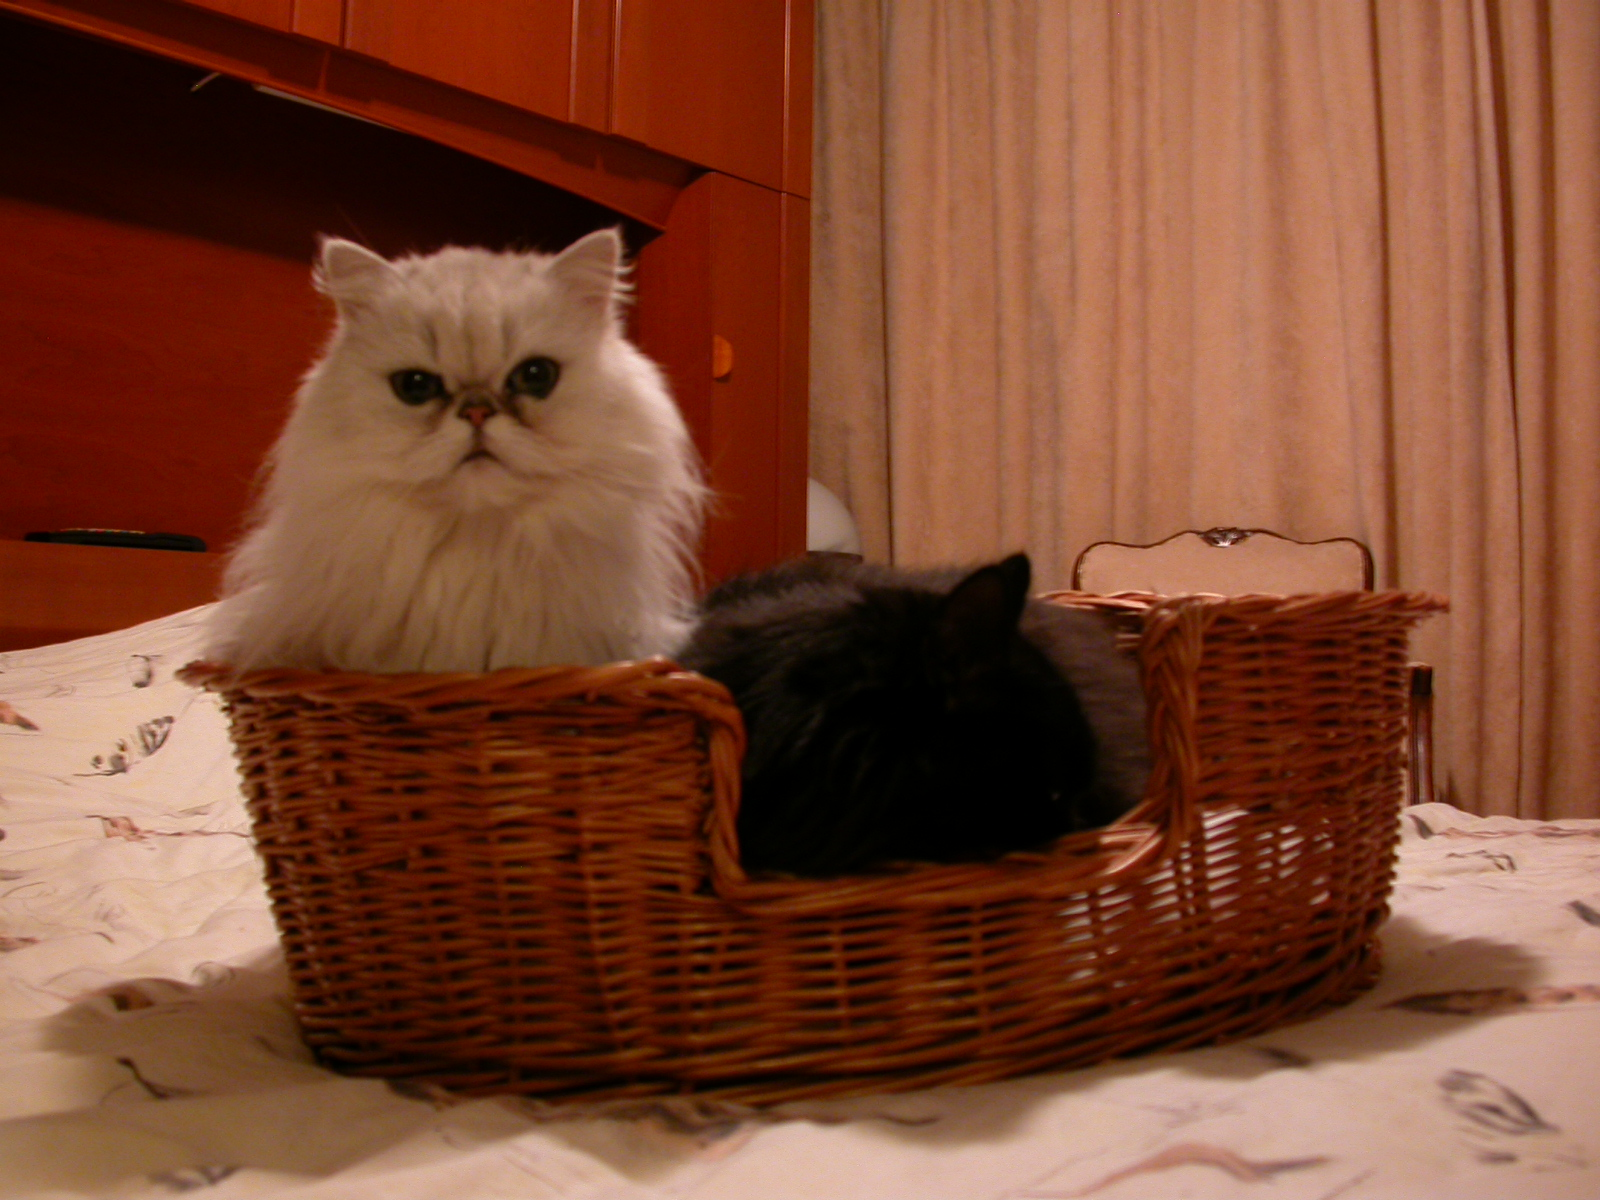 eva cat cats black and white basket fluffy fur sleeping cute pet pets